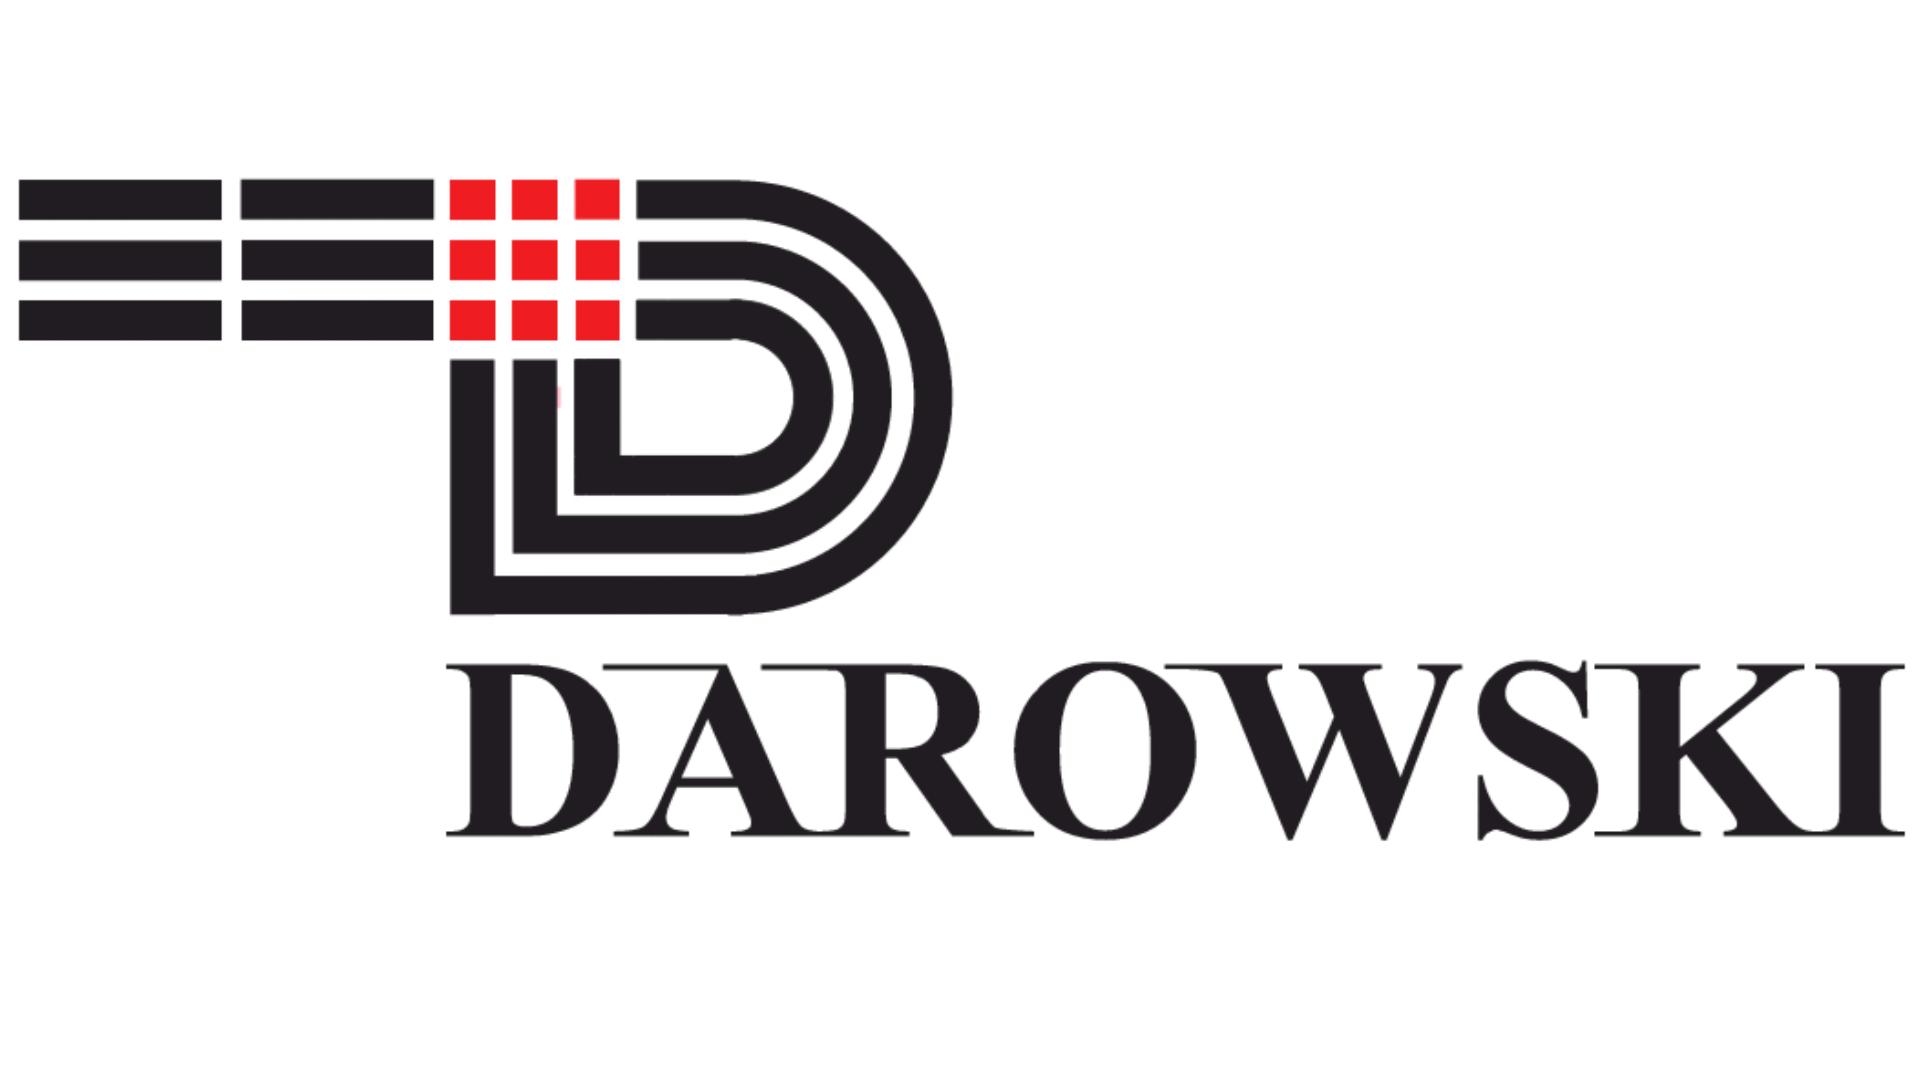 DAROWSKI KASSENSYSTEME